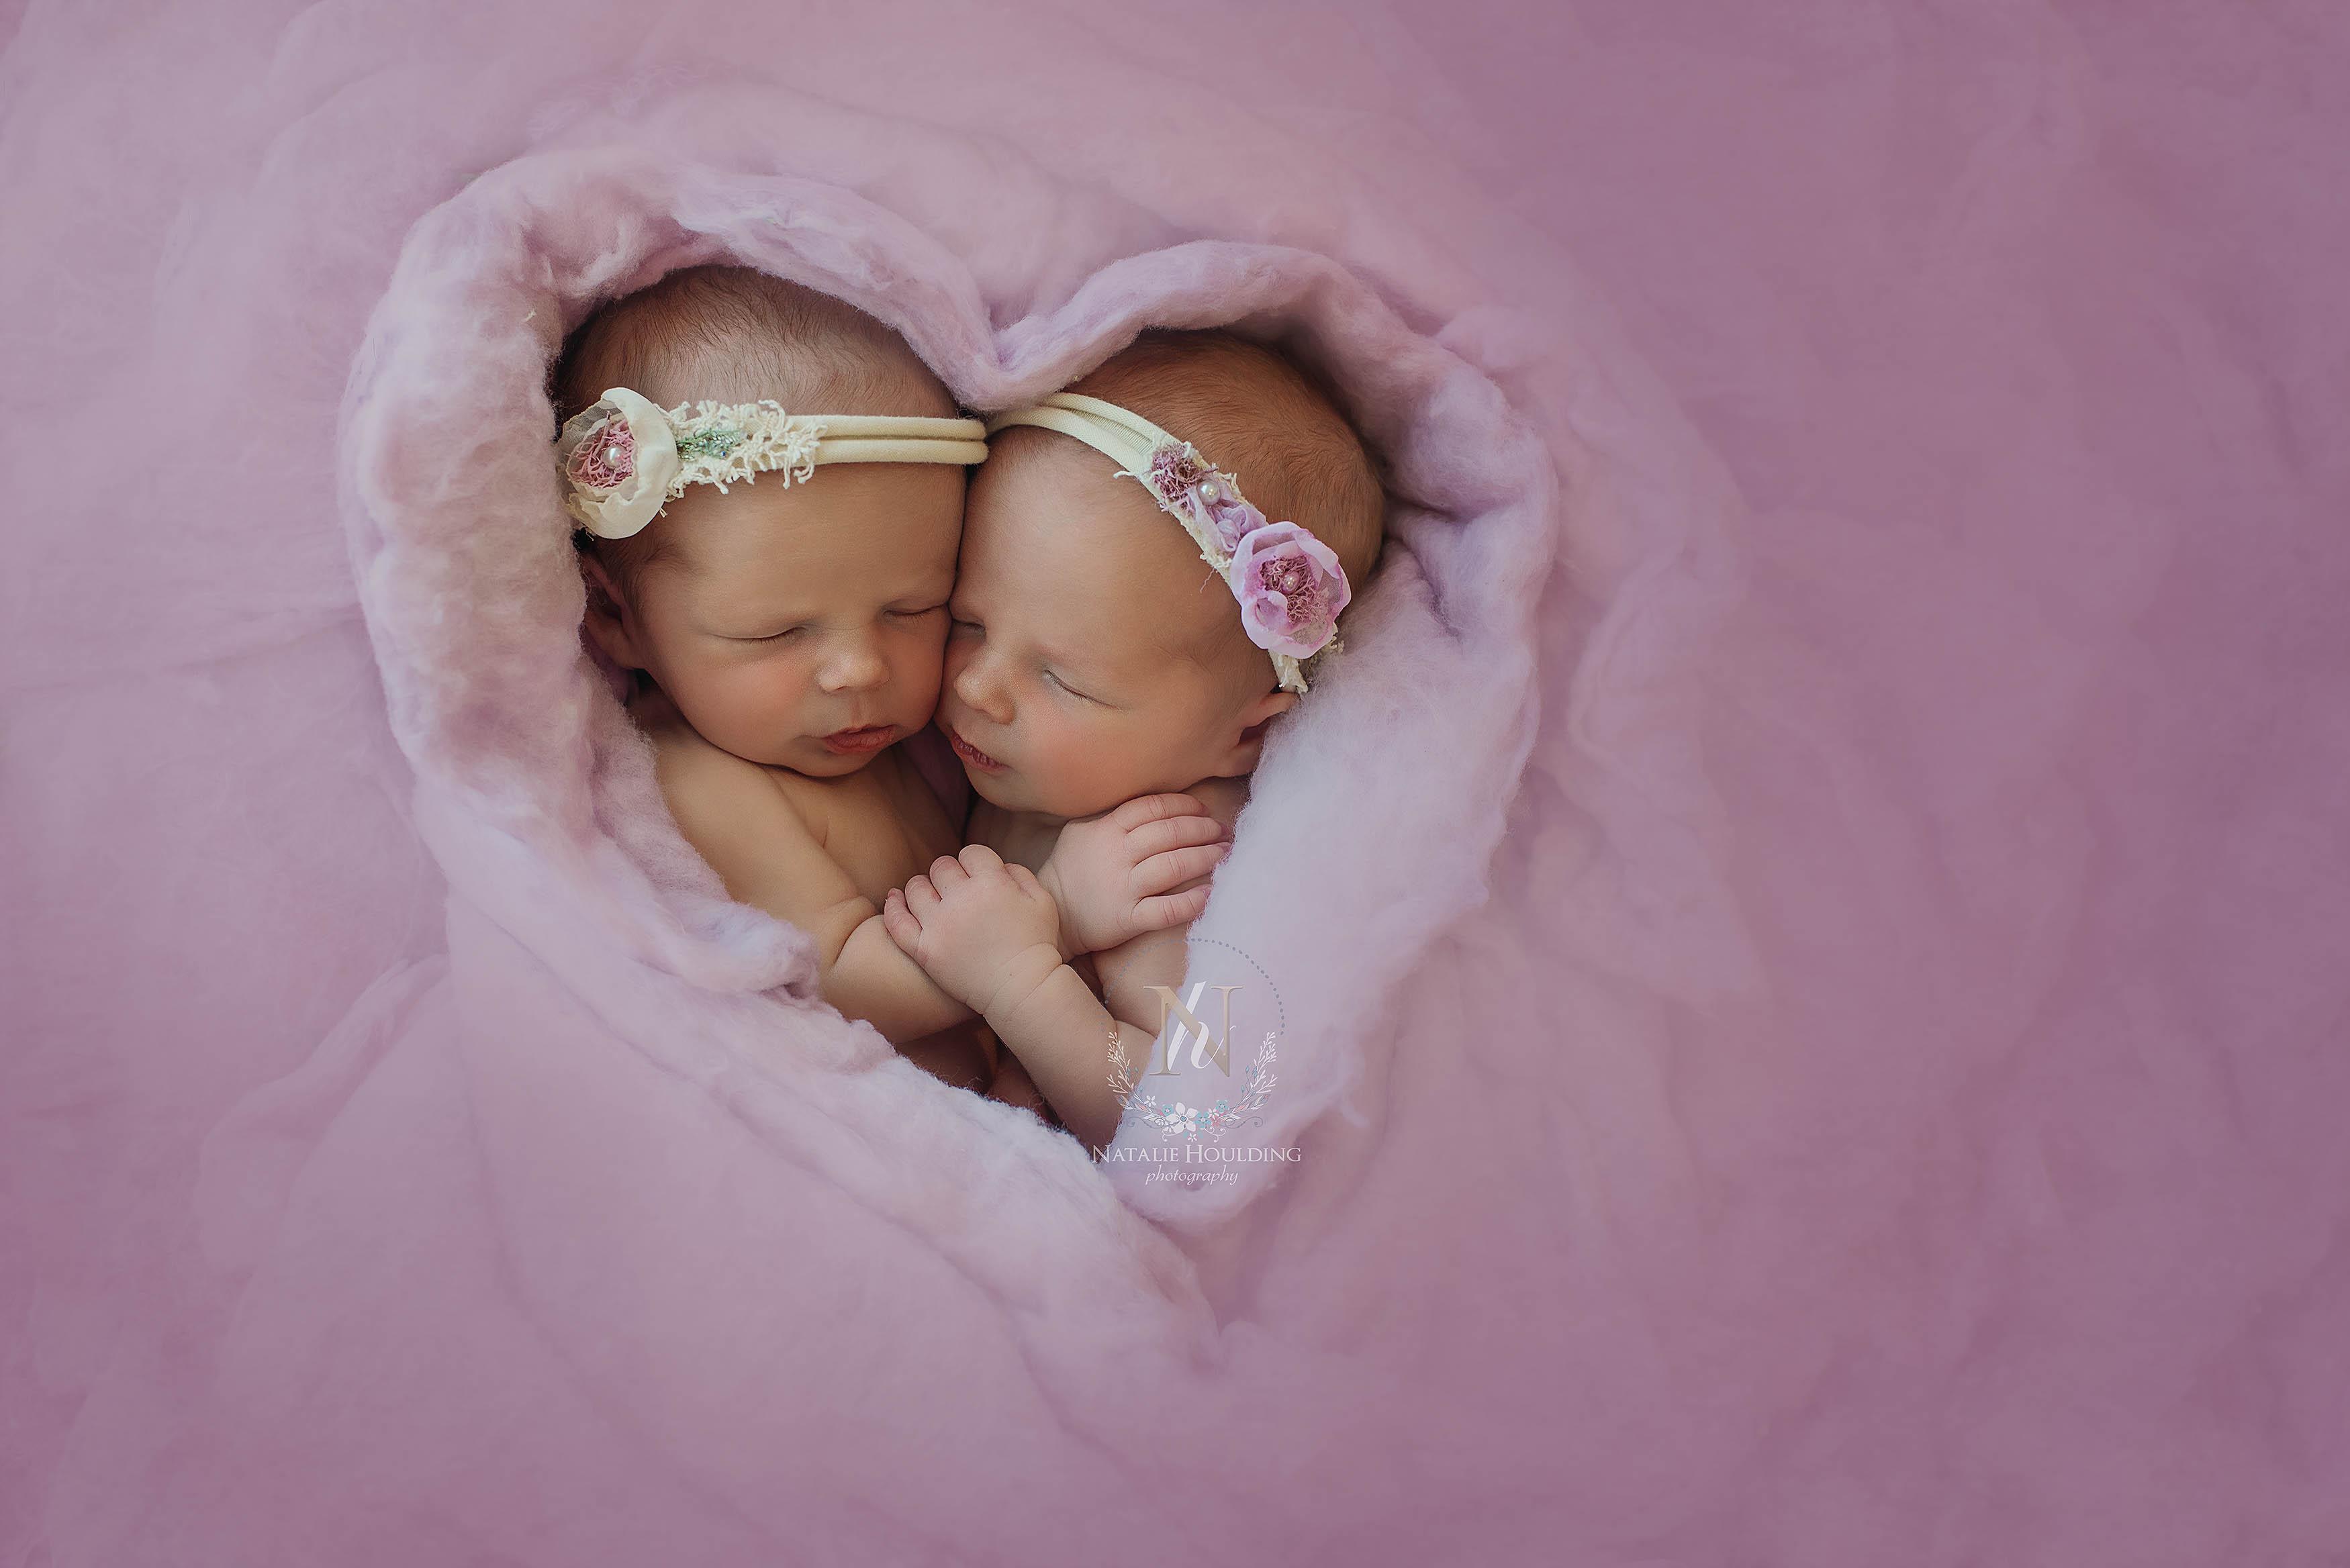 Twins_photo_nataliehouldingphotography_1